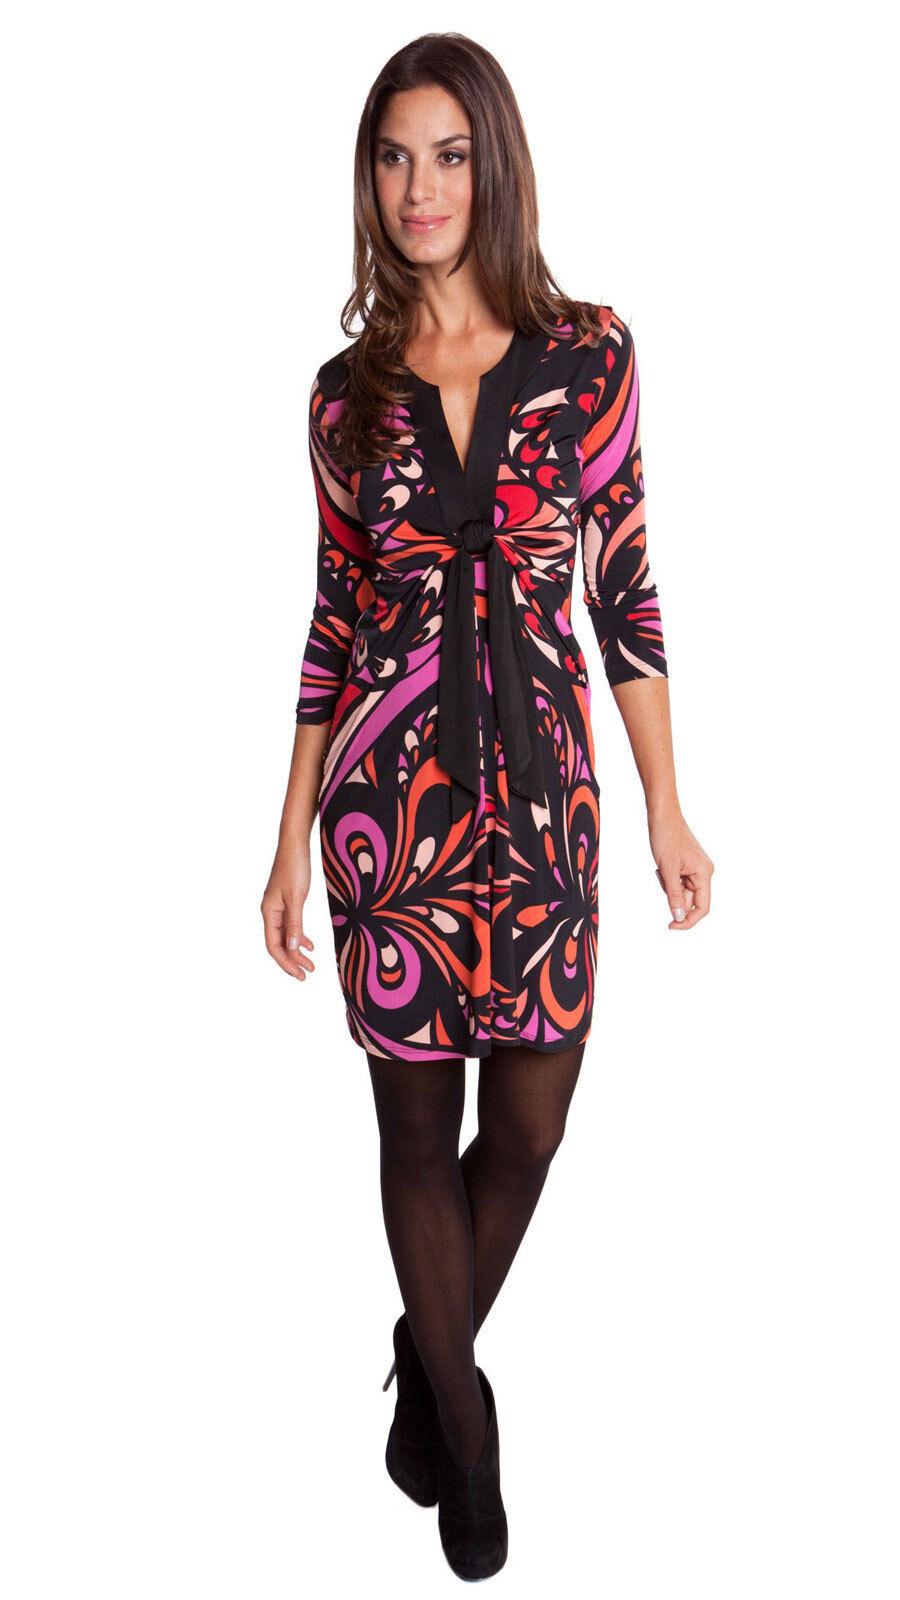 OLIAN Maternity Women's Fuchsia Swirl Print Twist Tie 3 4 Sleeve Dress  148 NWT